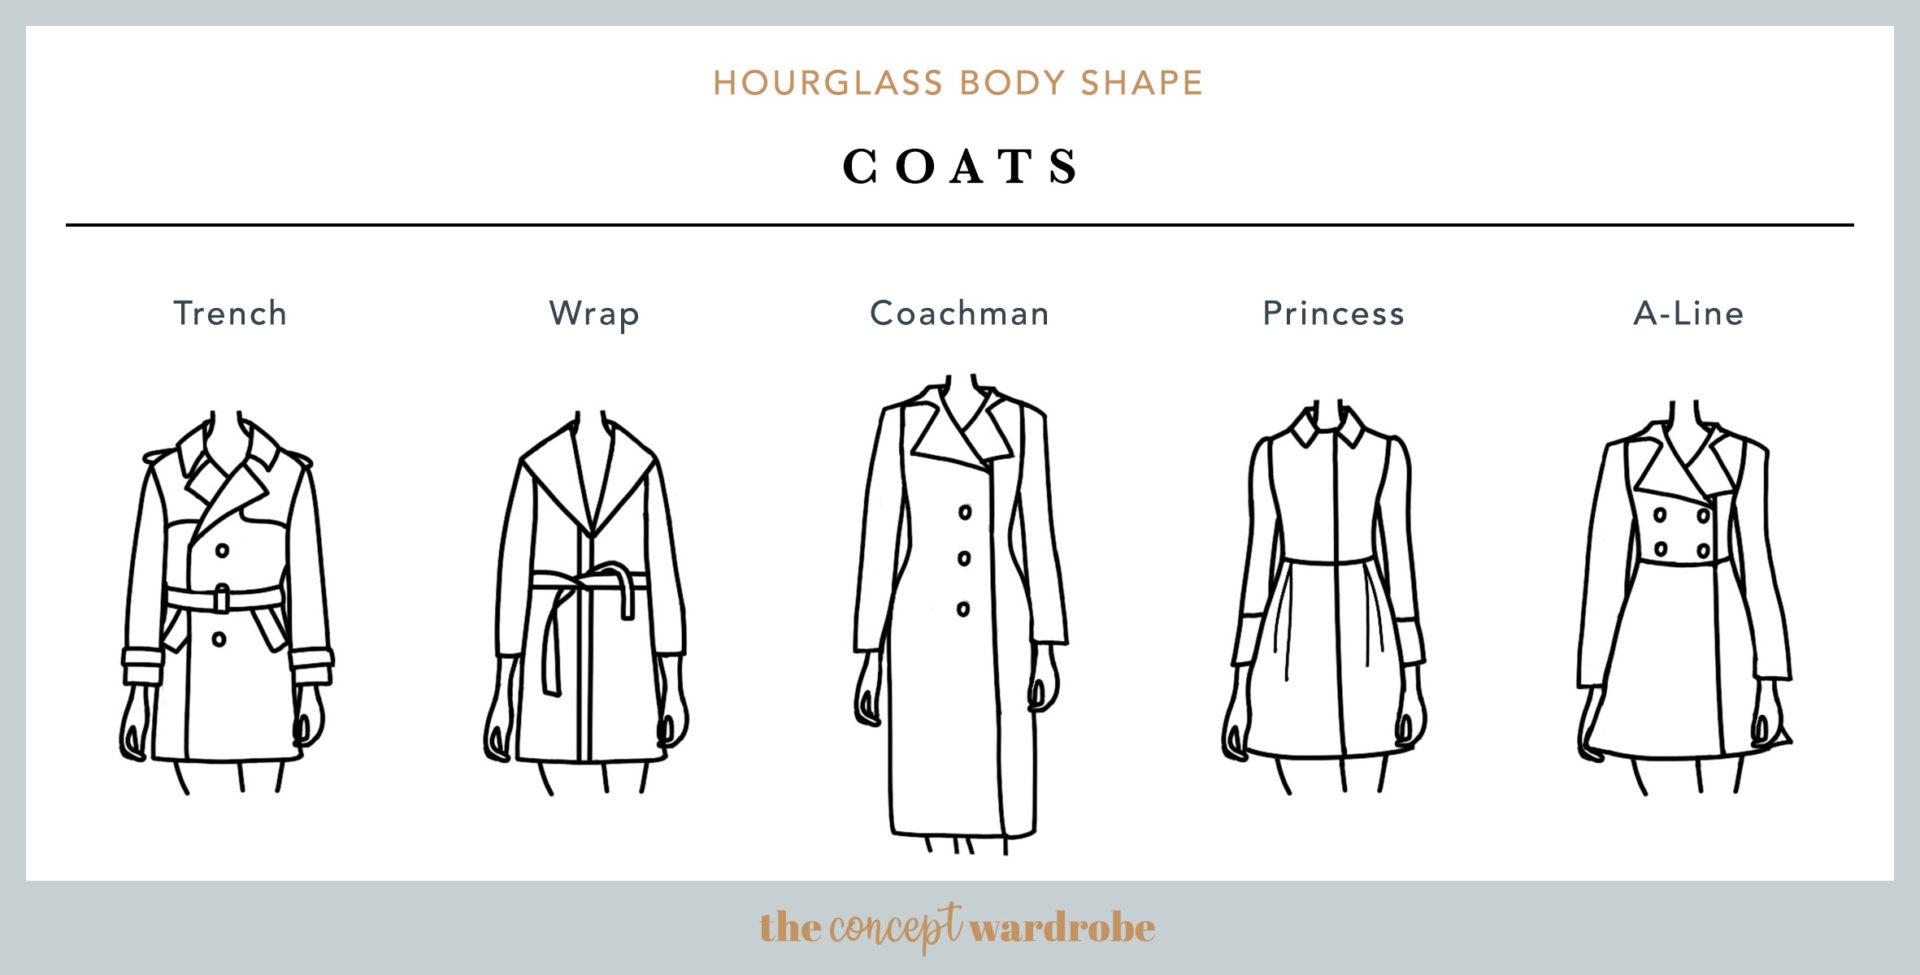 Hourglass Body Shape Coats - the concept wardrobe